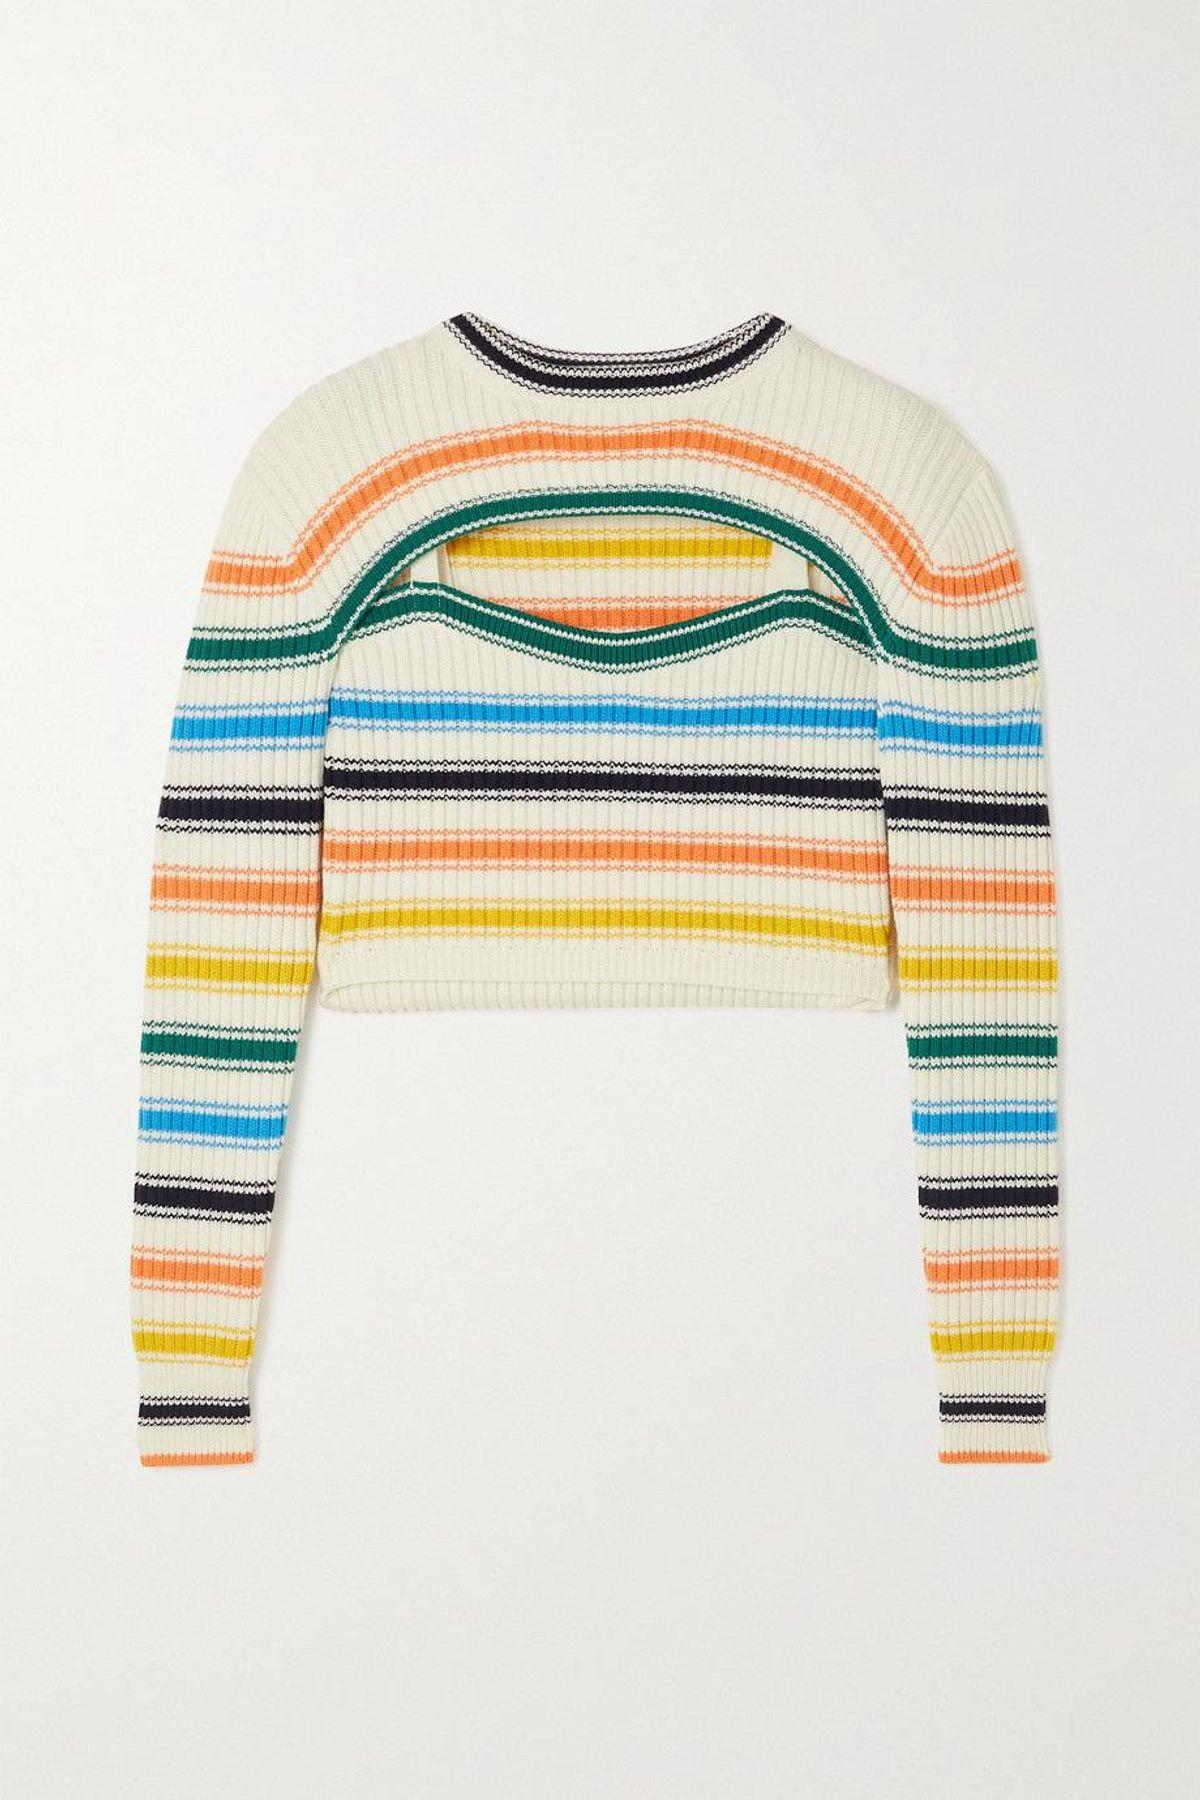 Thousand-in-One-Ways Rainbow Sweater